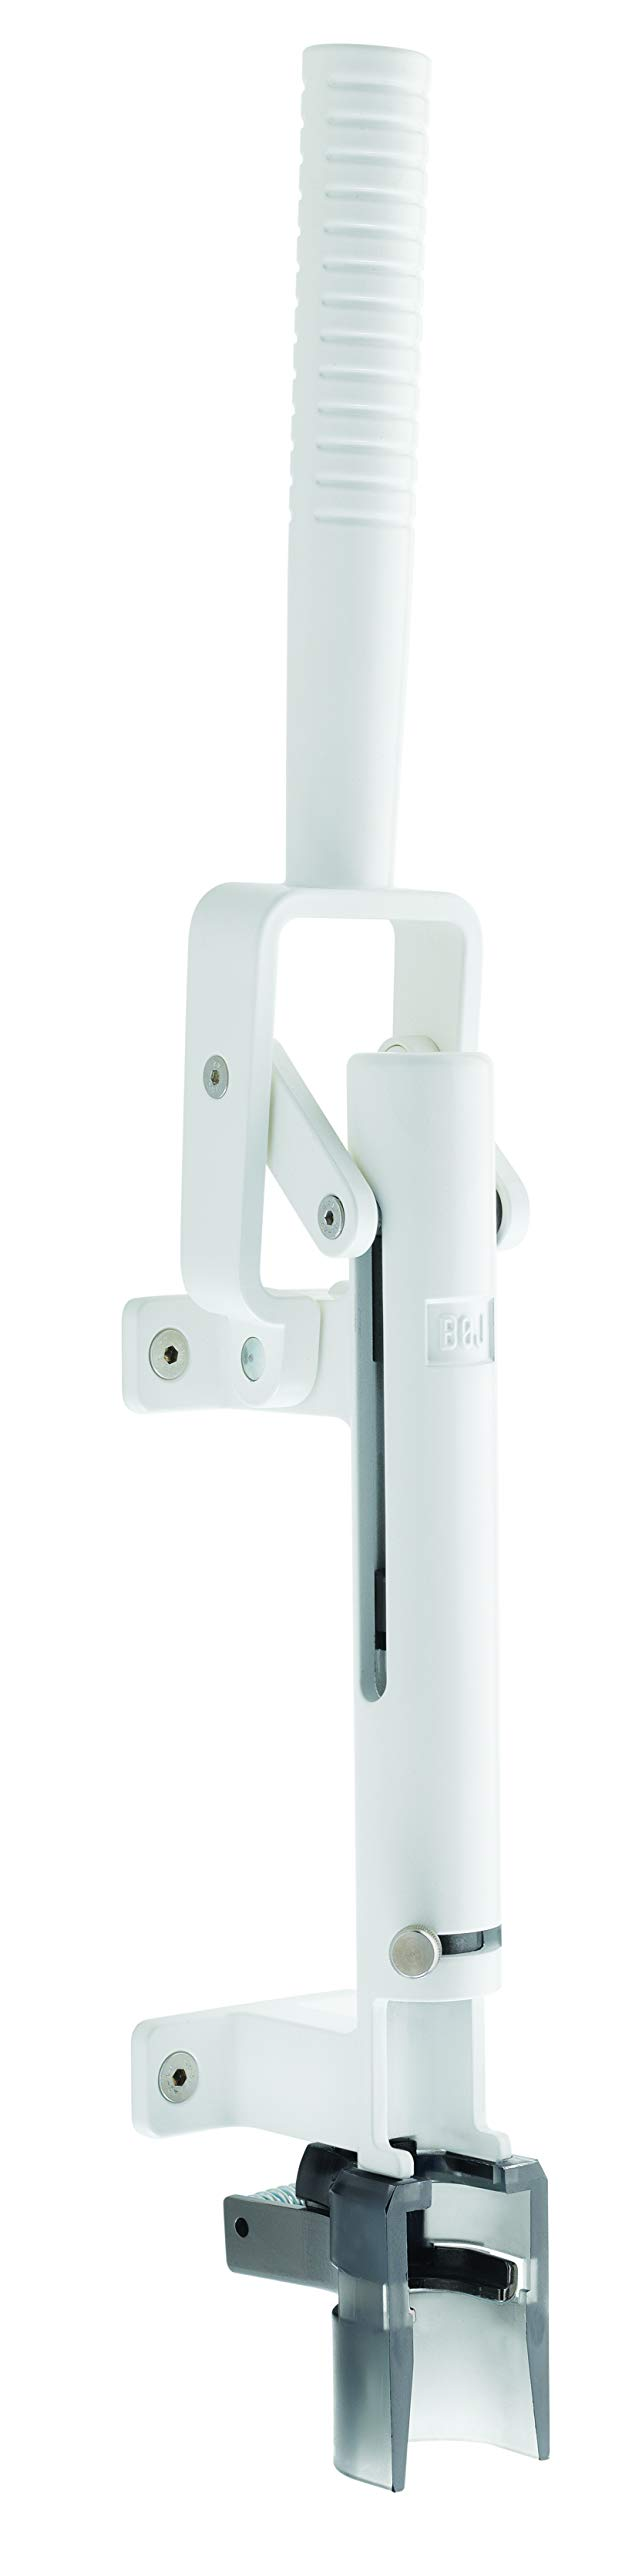 BOJ Professional Wall-mounted Corkscrew Wine Opener Model 110 (White)